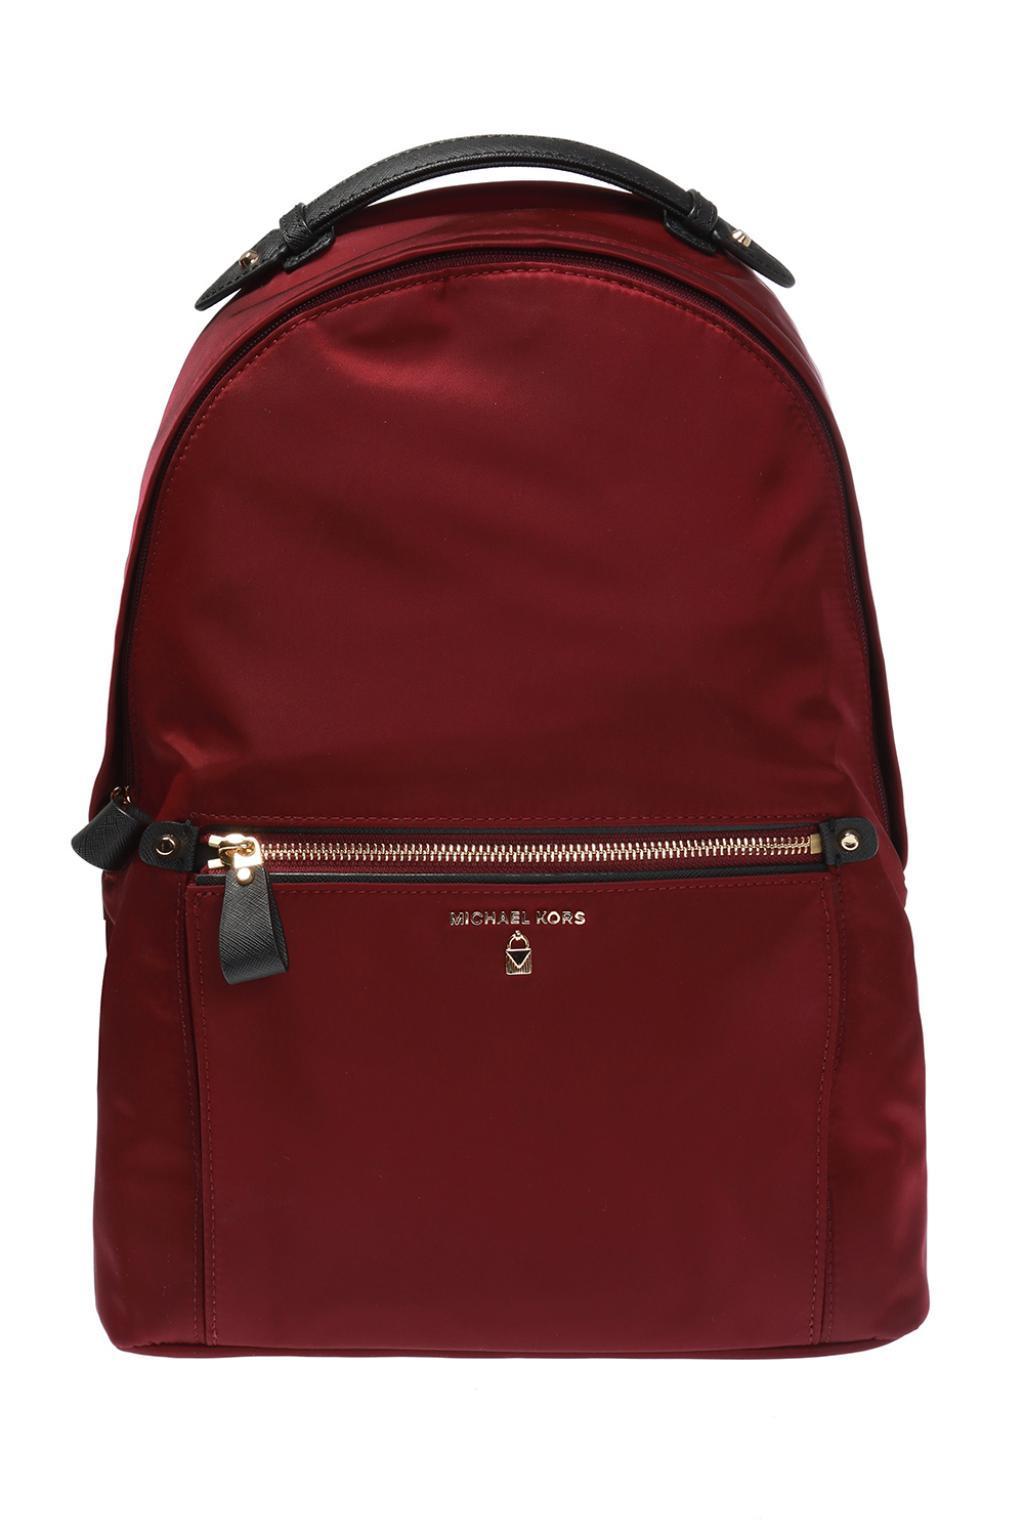 8497641cd61c Michael Kors - Multicolor 'kelsey' Backpack - Lyst. View fullscreen